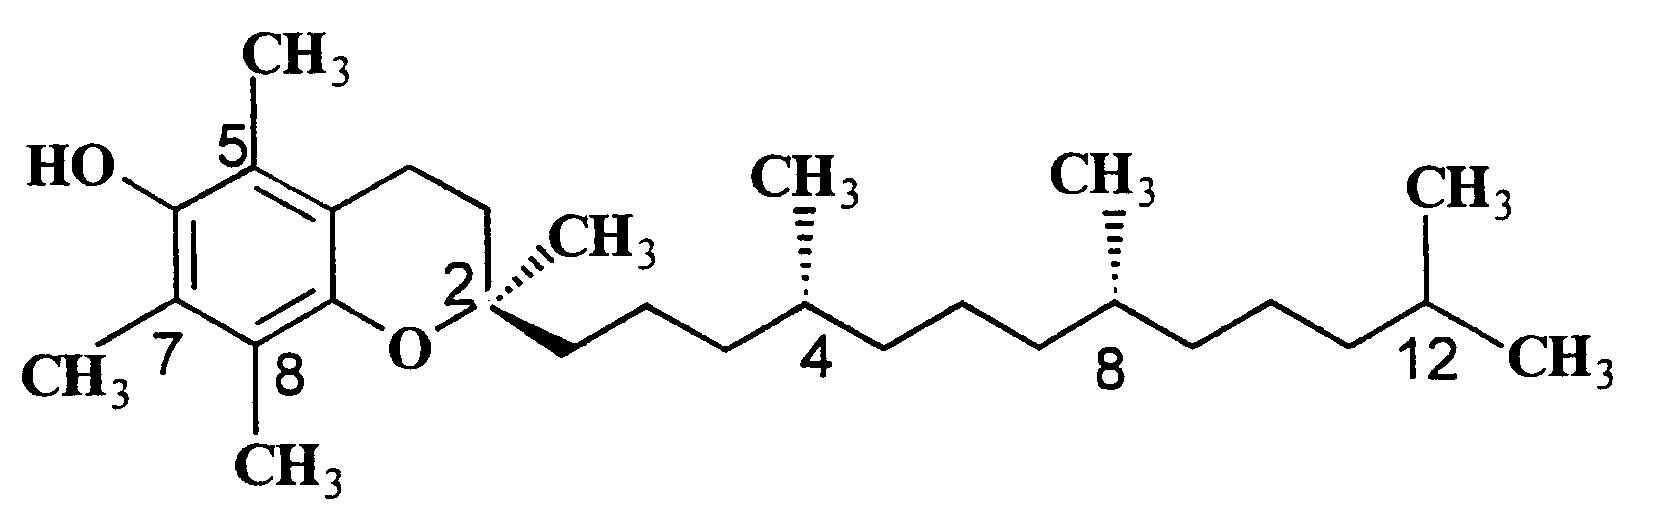 Figure 112001030703581-pct00003